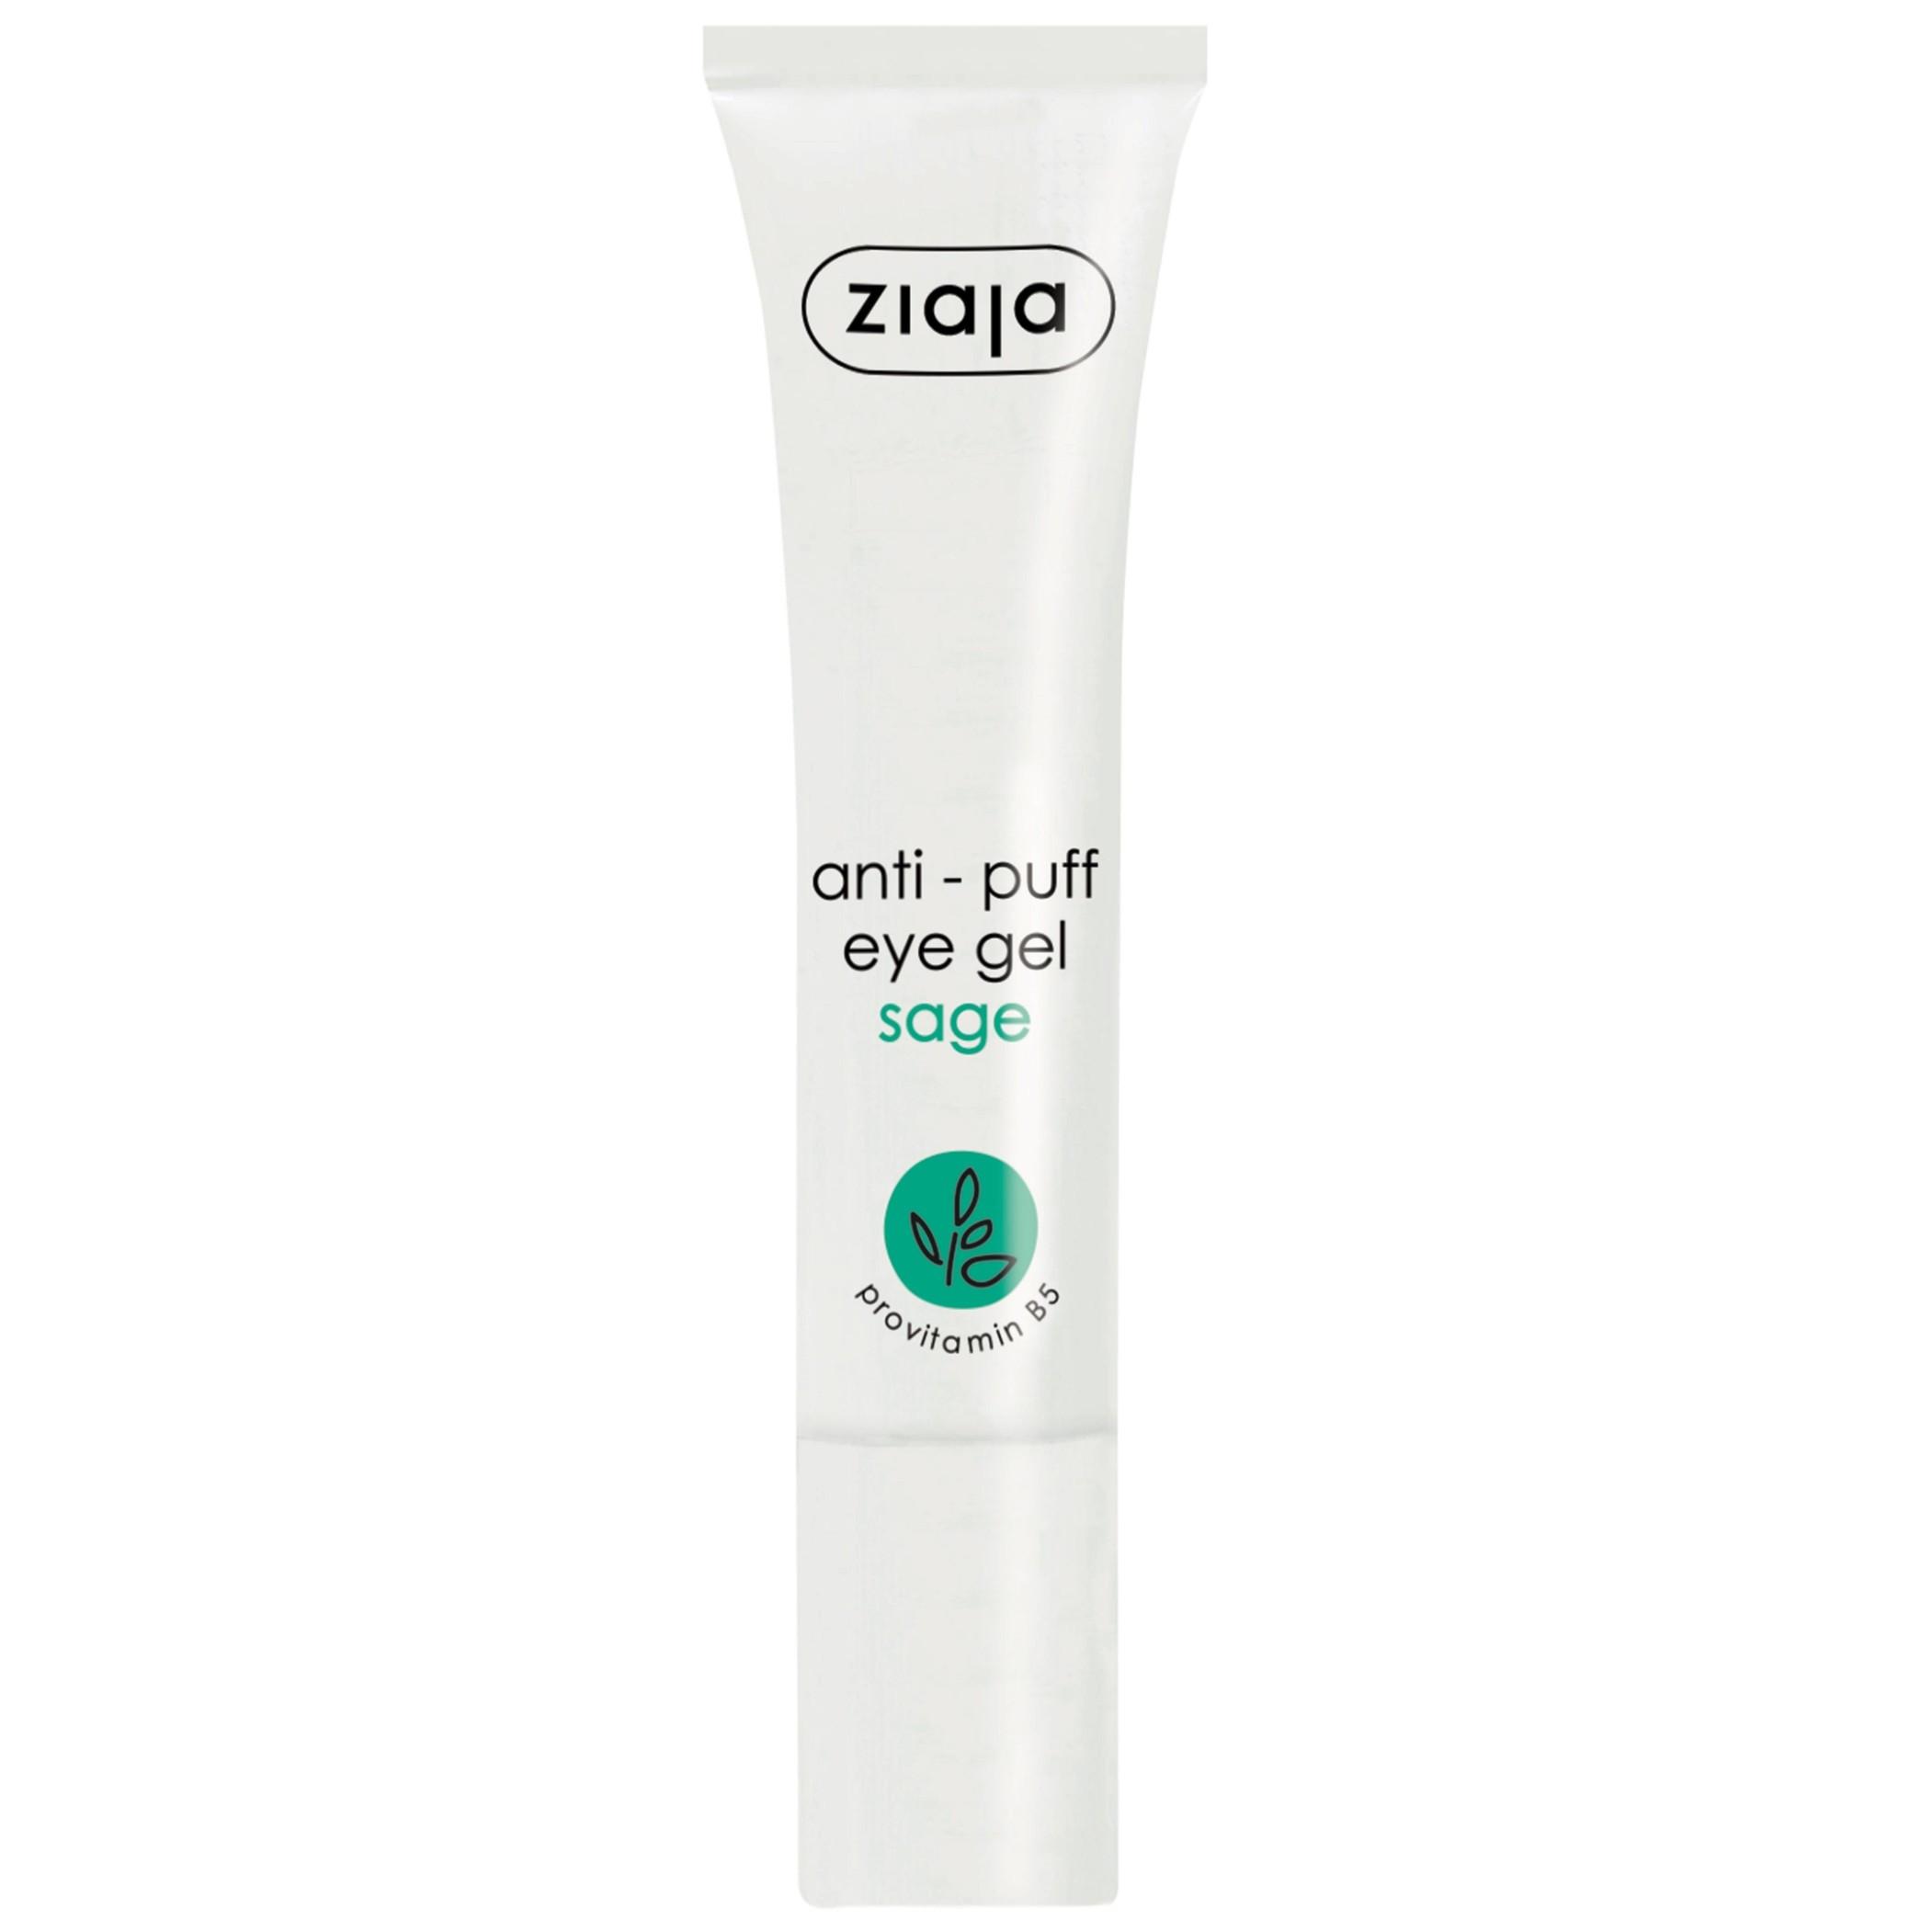 ЖАЯ Околоочен гел против образуване на торбички с екстракт от градински чай 15мл | ZIAJA Anti-puff eye gel sage 15ml